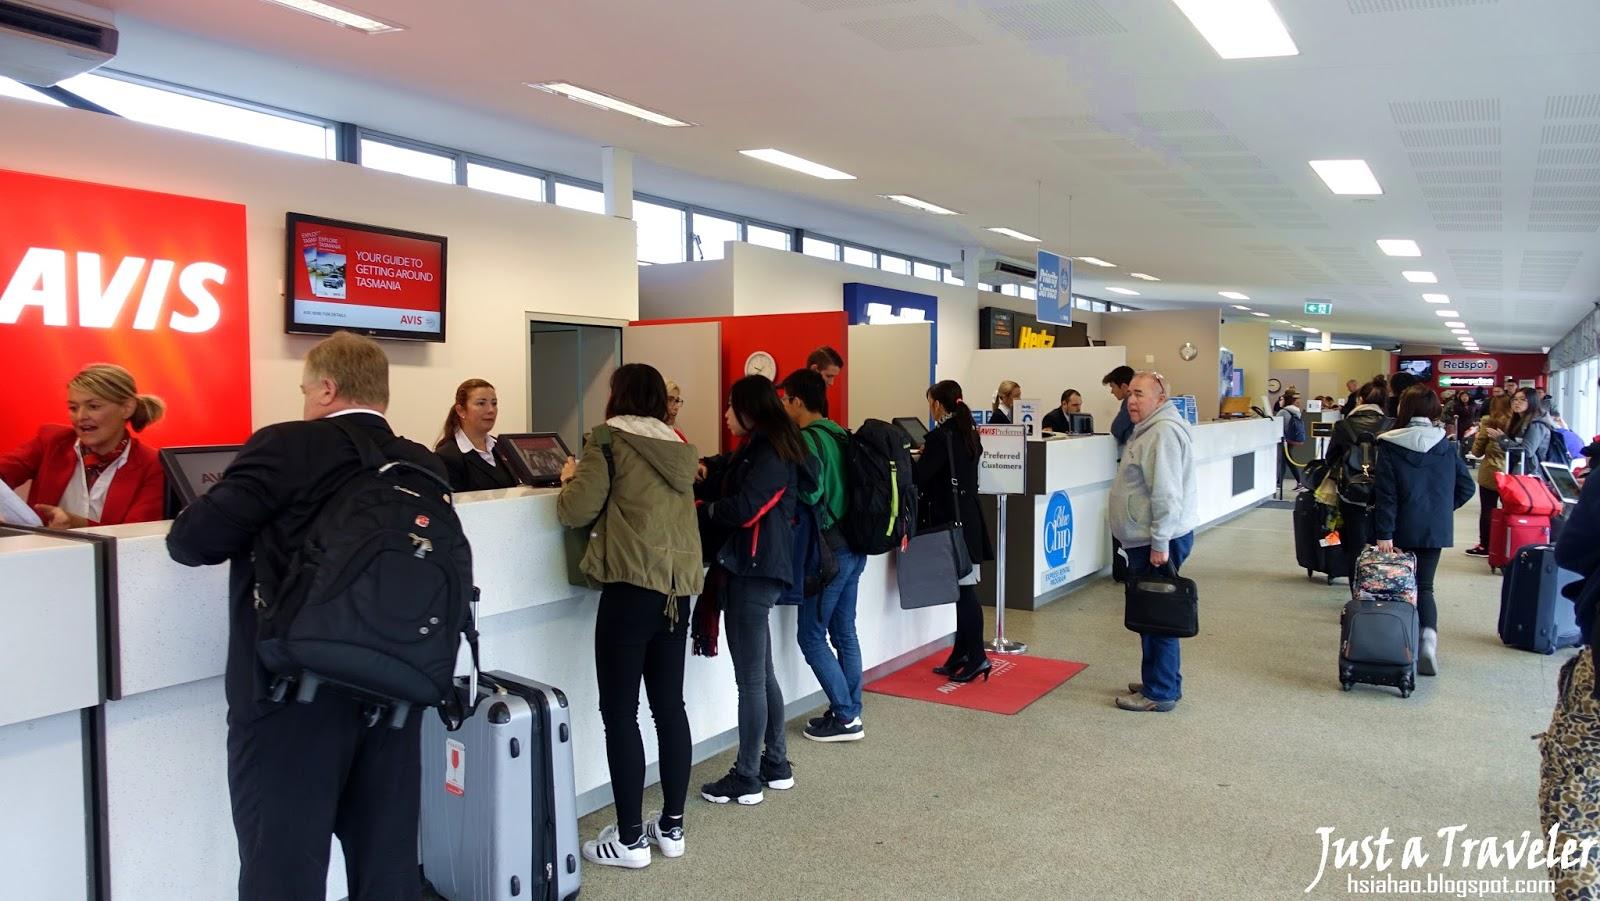 塔斯馬尼亞-租車-自駕-推薦-荷伯特-機場-Hobart-Airport-Tasmania-Car-Rental-Australia